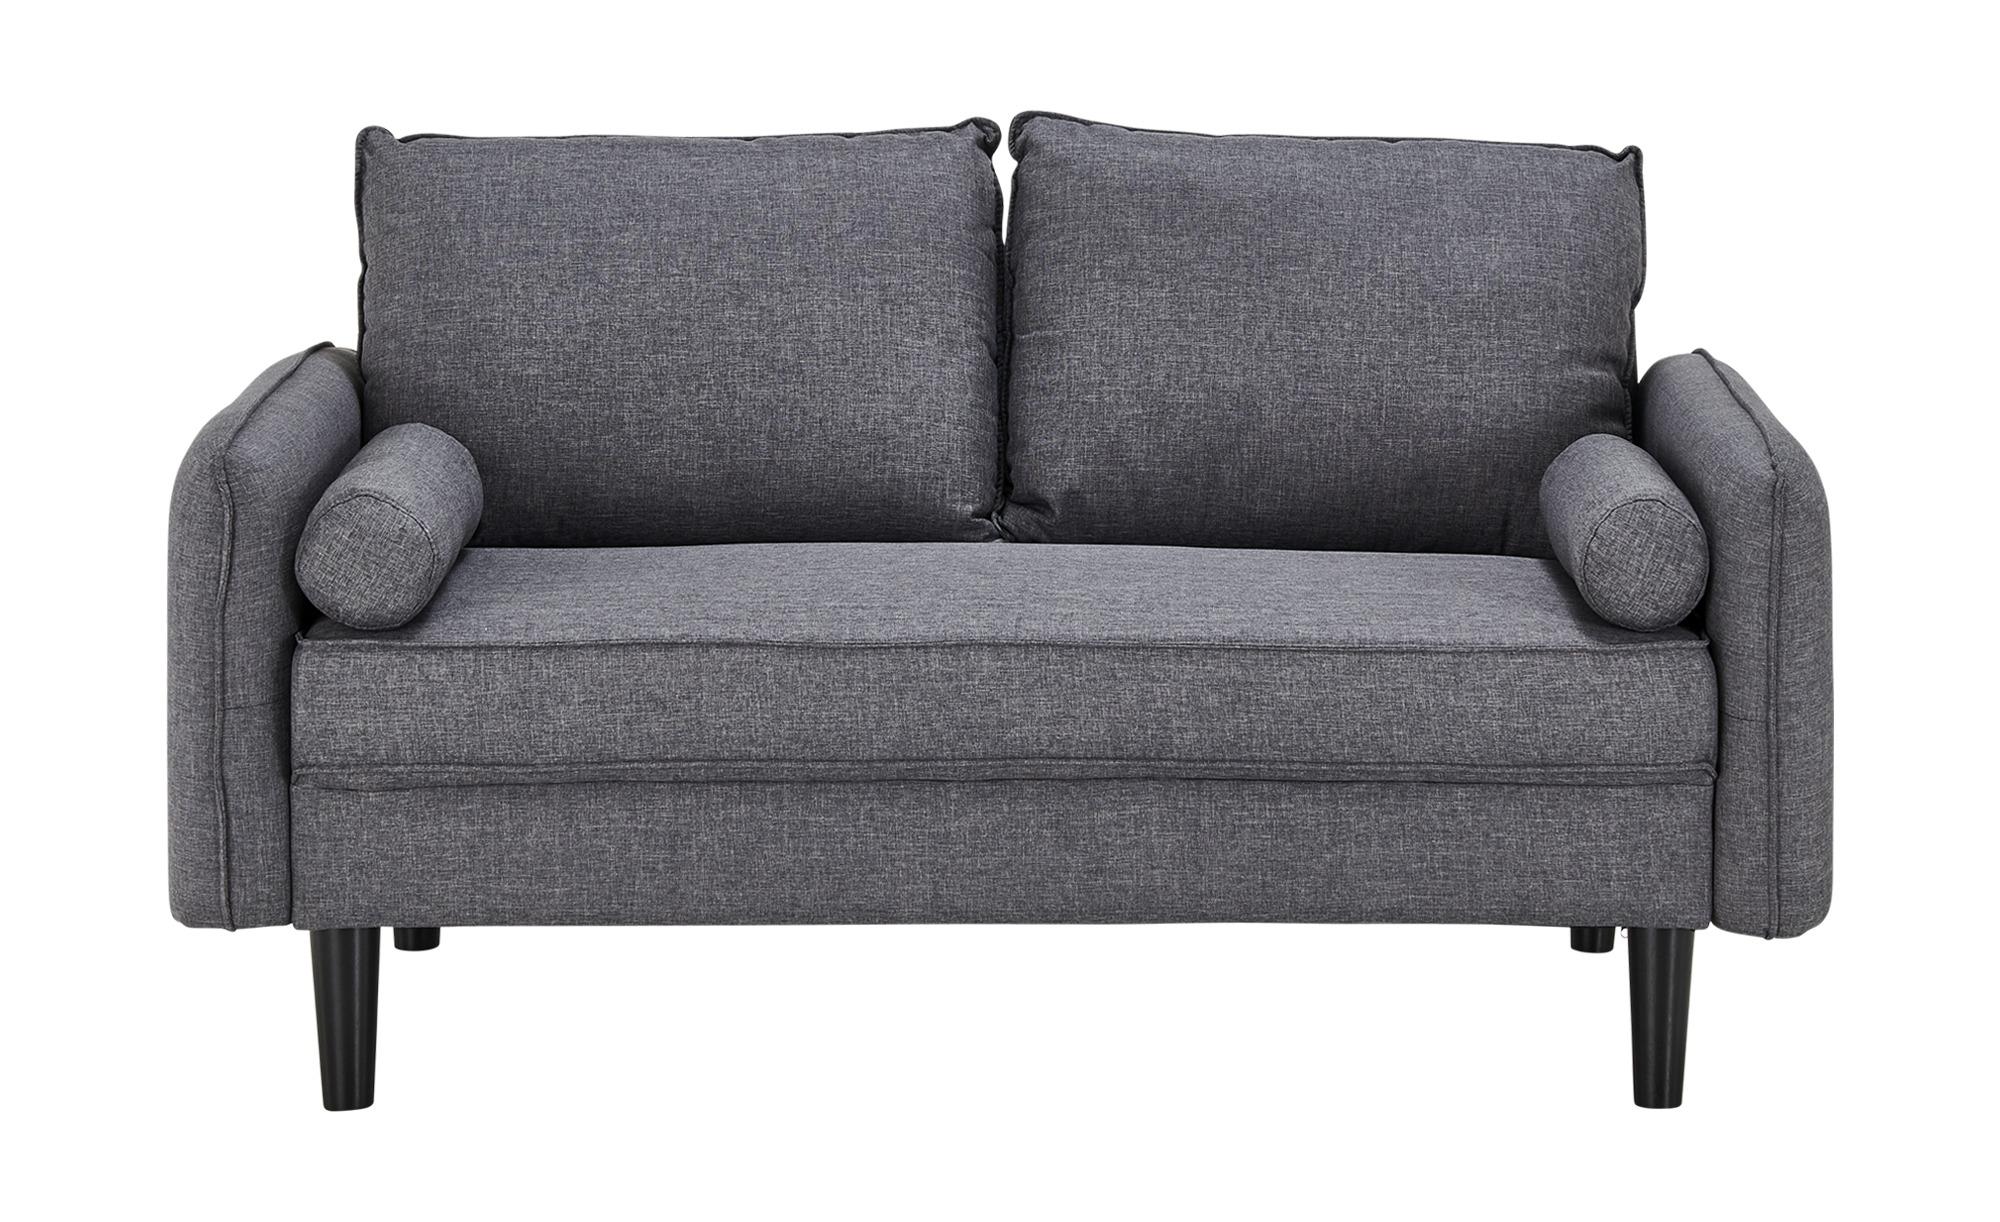 Sofa 2 Sitzig Quinn Grau Masse Cm B 151 H 83 T 82 Polstermobel Sofas 2 Sitzer Hoffner Sofa Gunstige Sofas Billige Couch